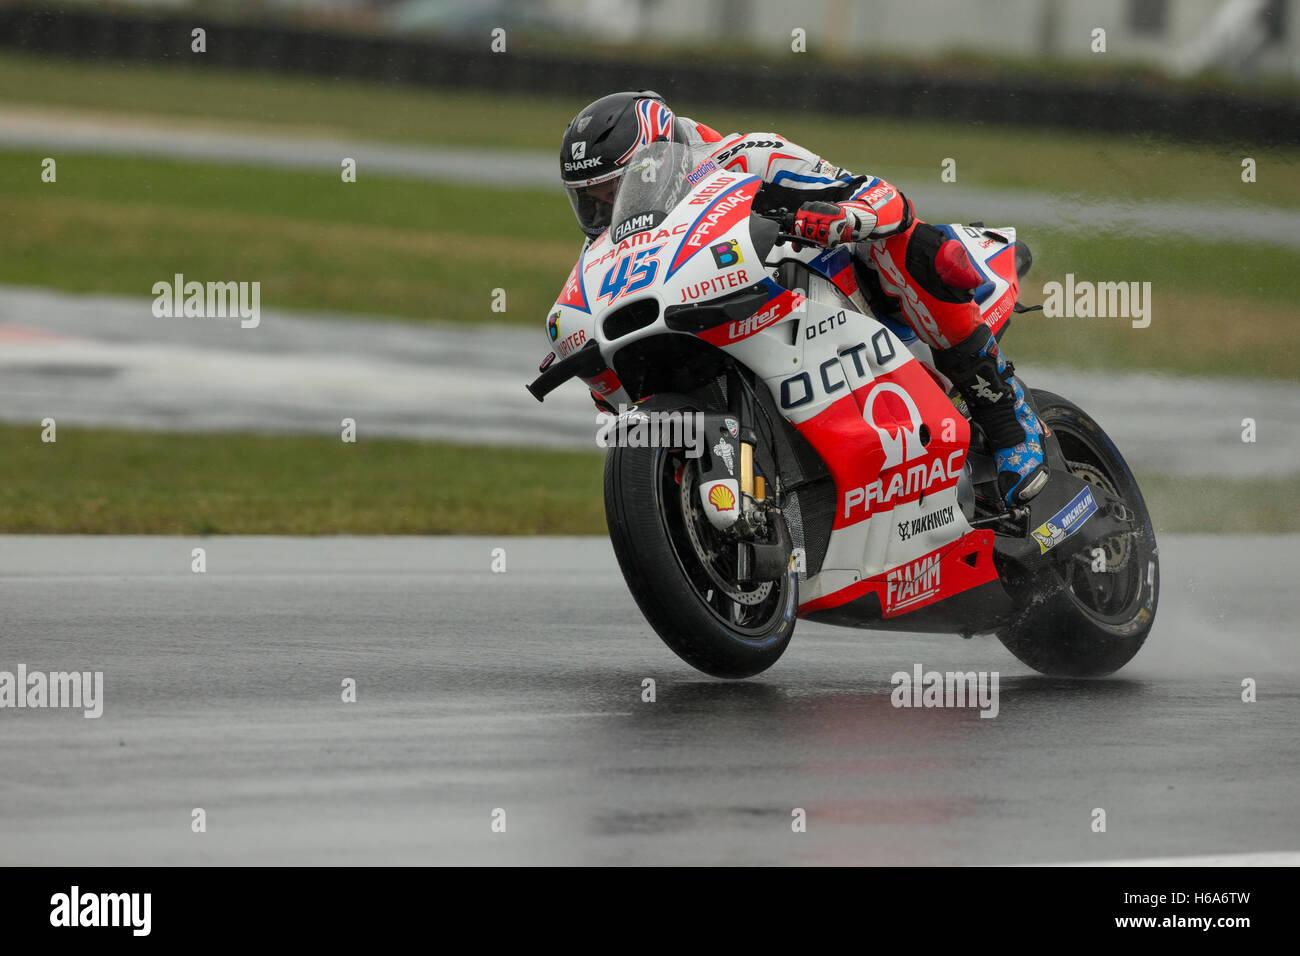 Ducati Motogp Wheelie Stock Photos & Ducati Motogp Wheelie Stock Images - Alamy